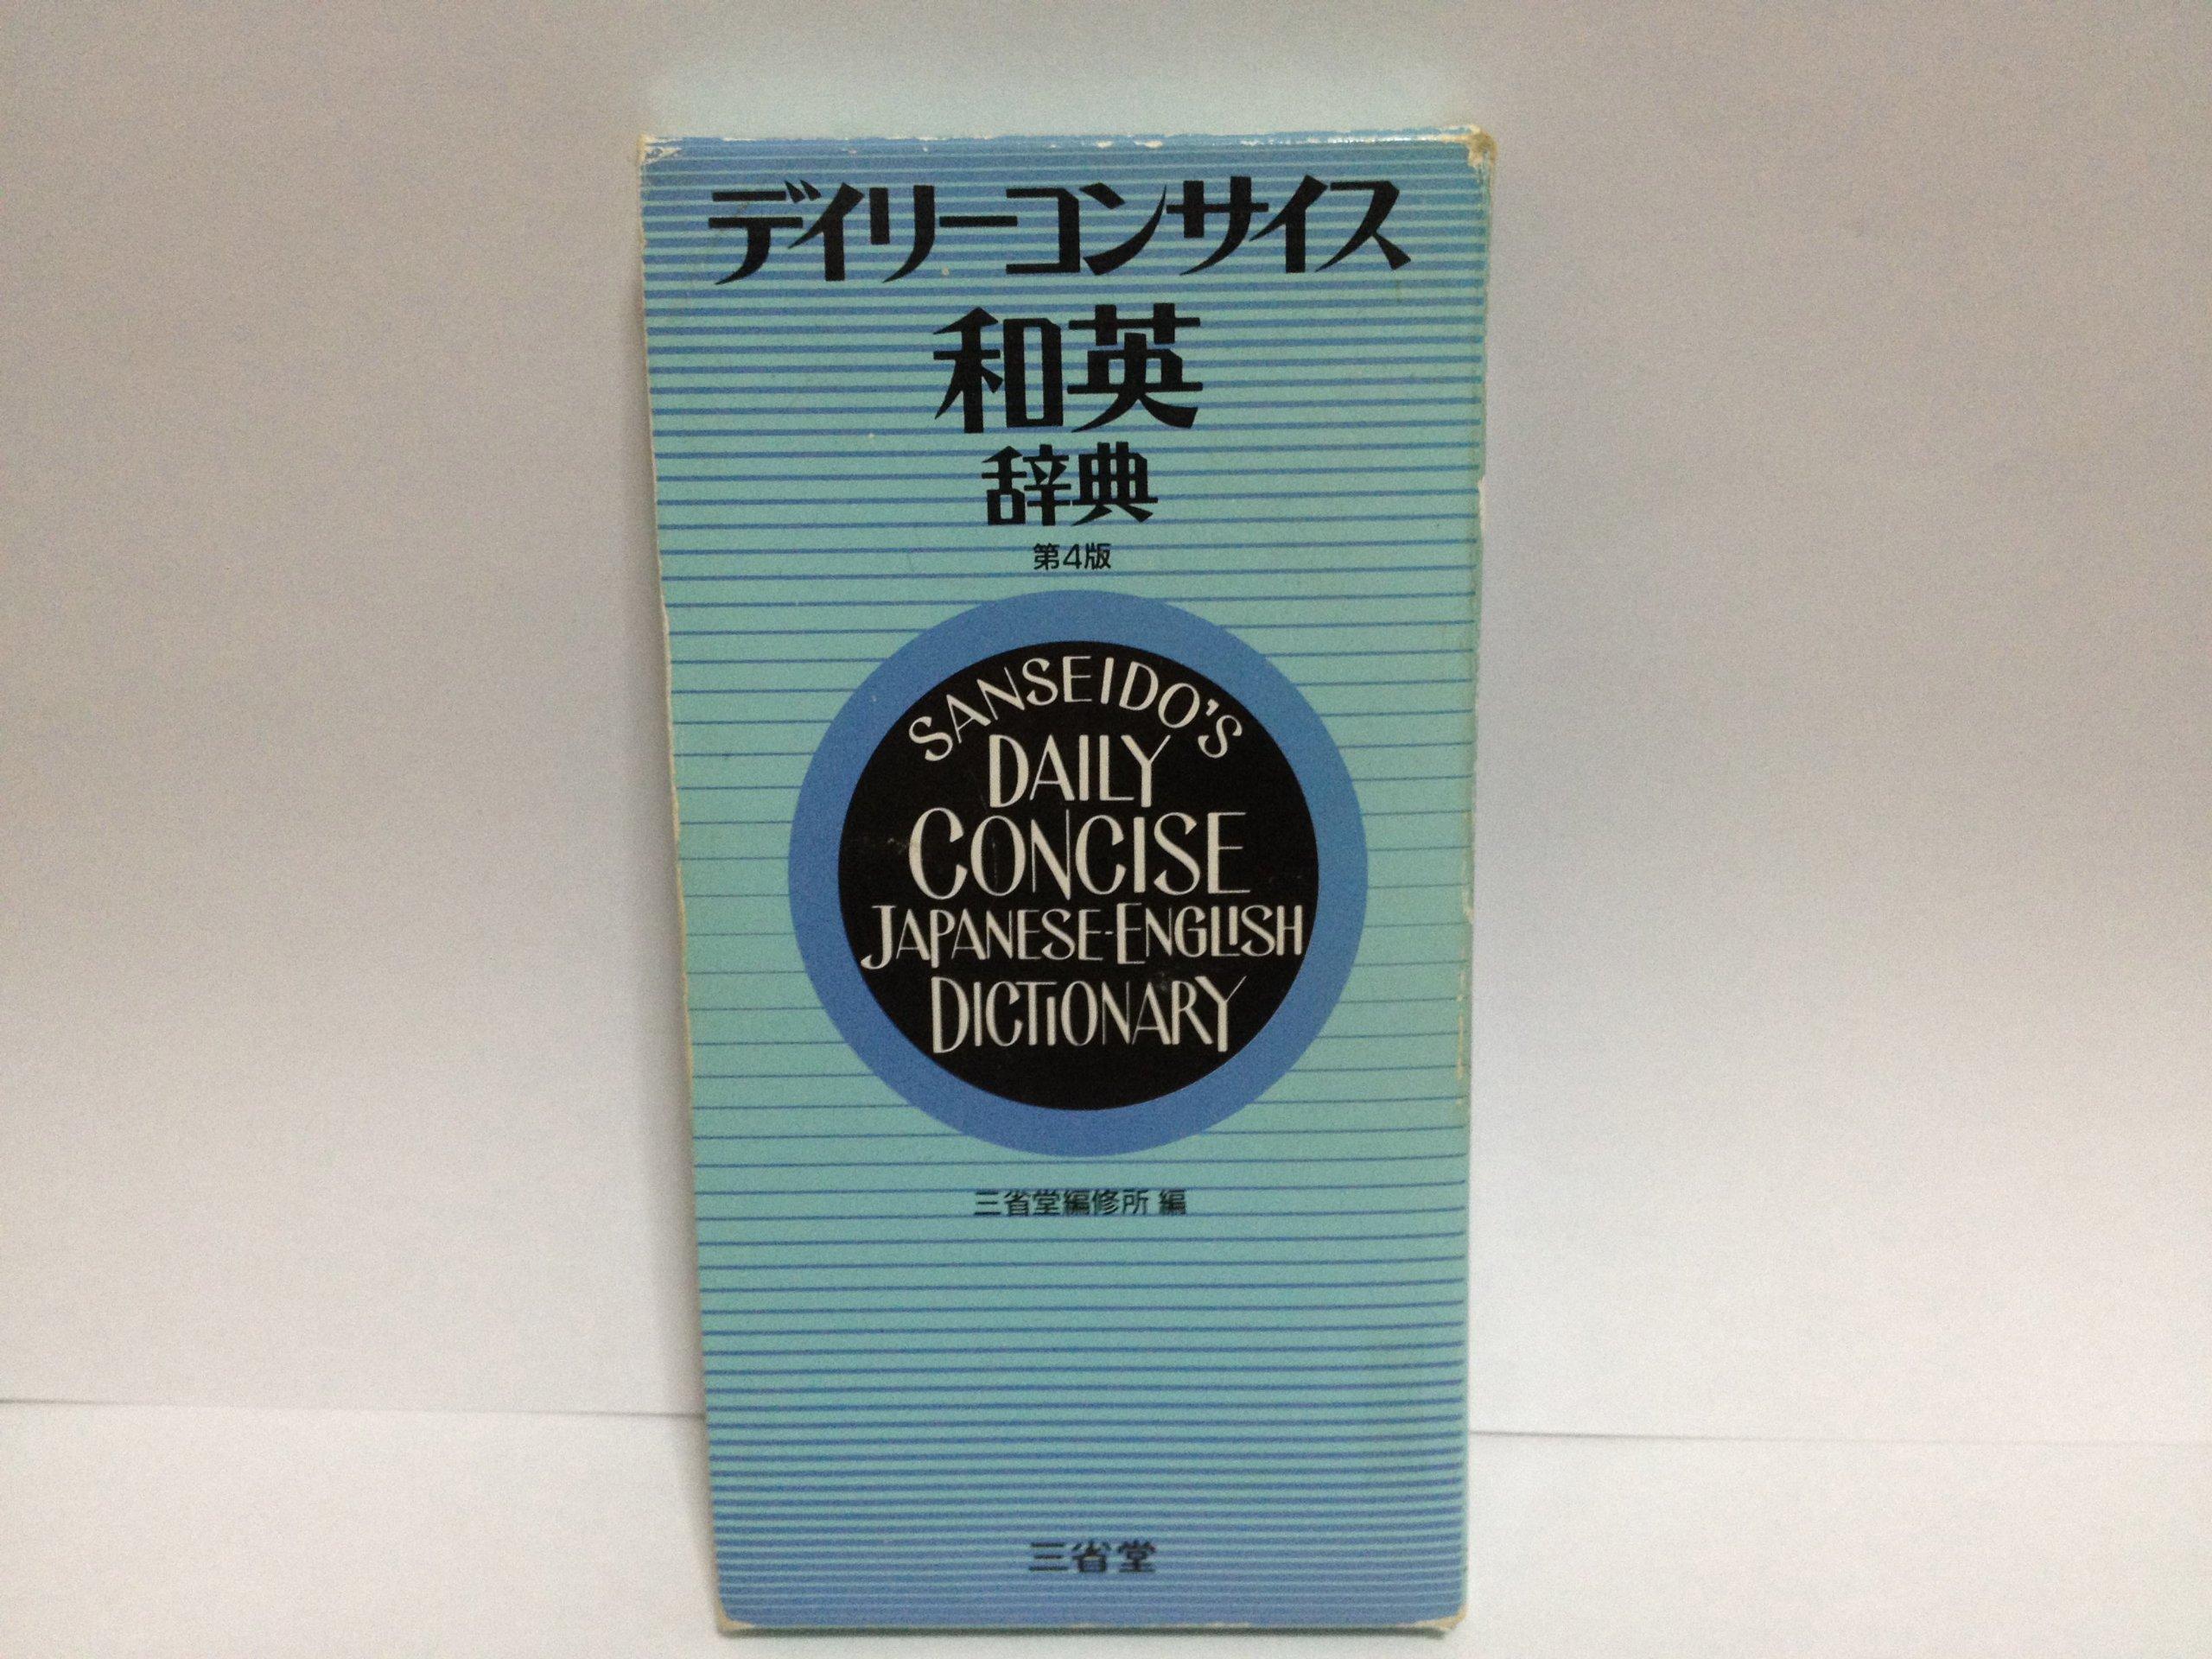 Daily Concise Japanese English Dictionary: Sanseido: 9784385102788:  Amazon.com: Books